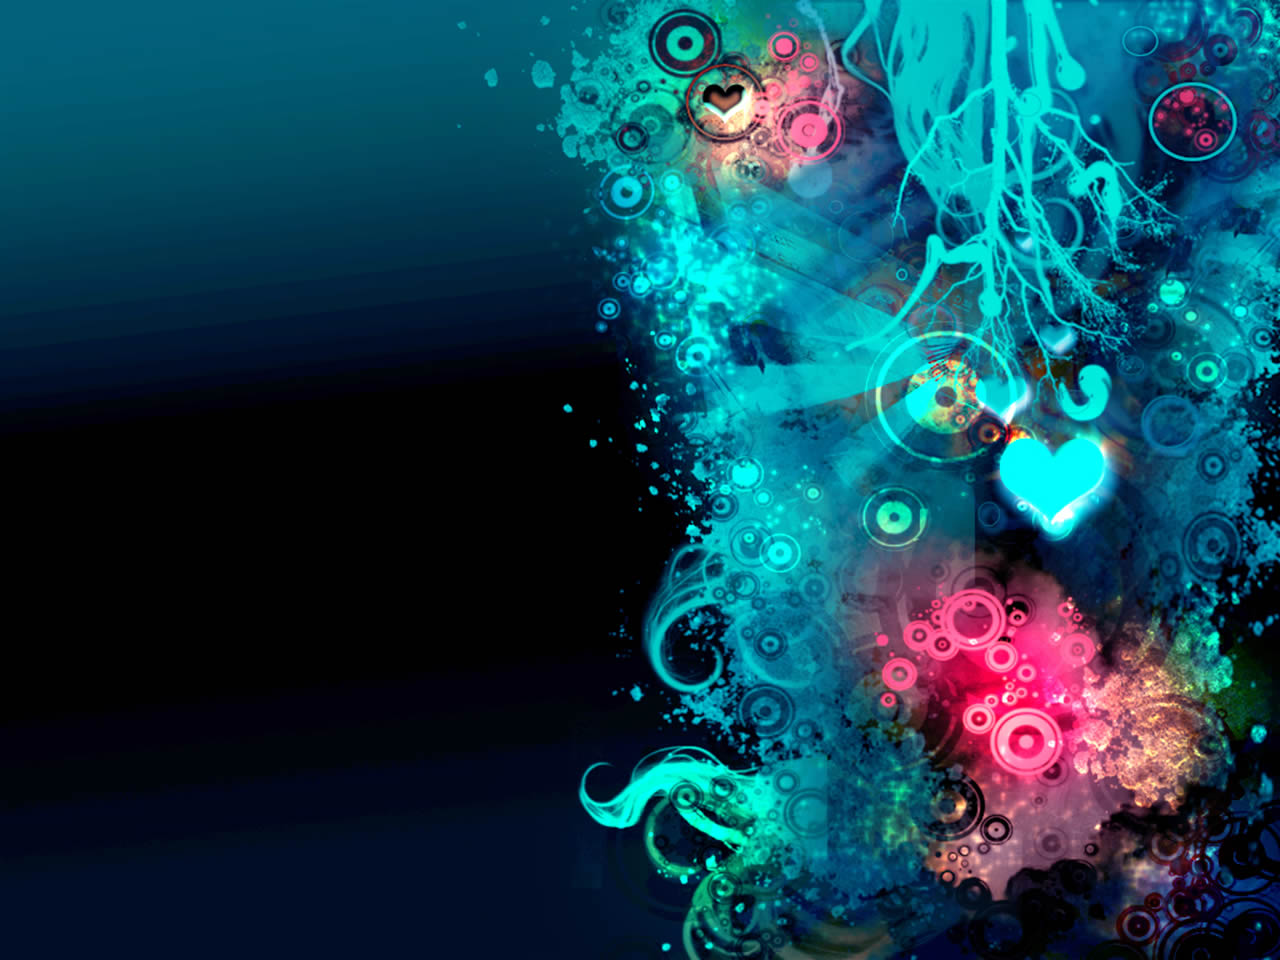 Love Forever Hd Wallpaper: Love Wallpapers Hd, Amor Fondos De Pantalla, Love 3D